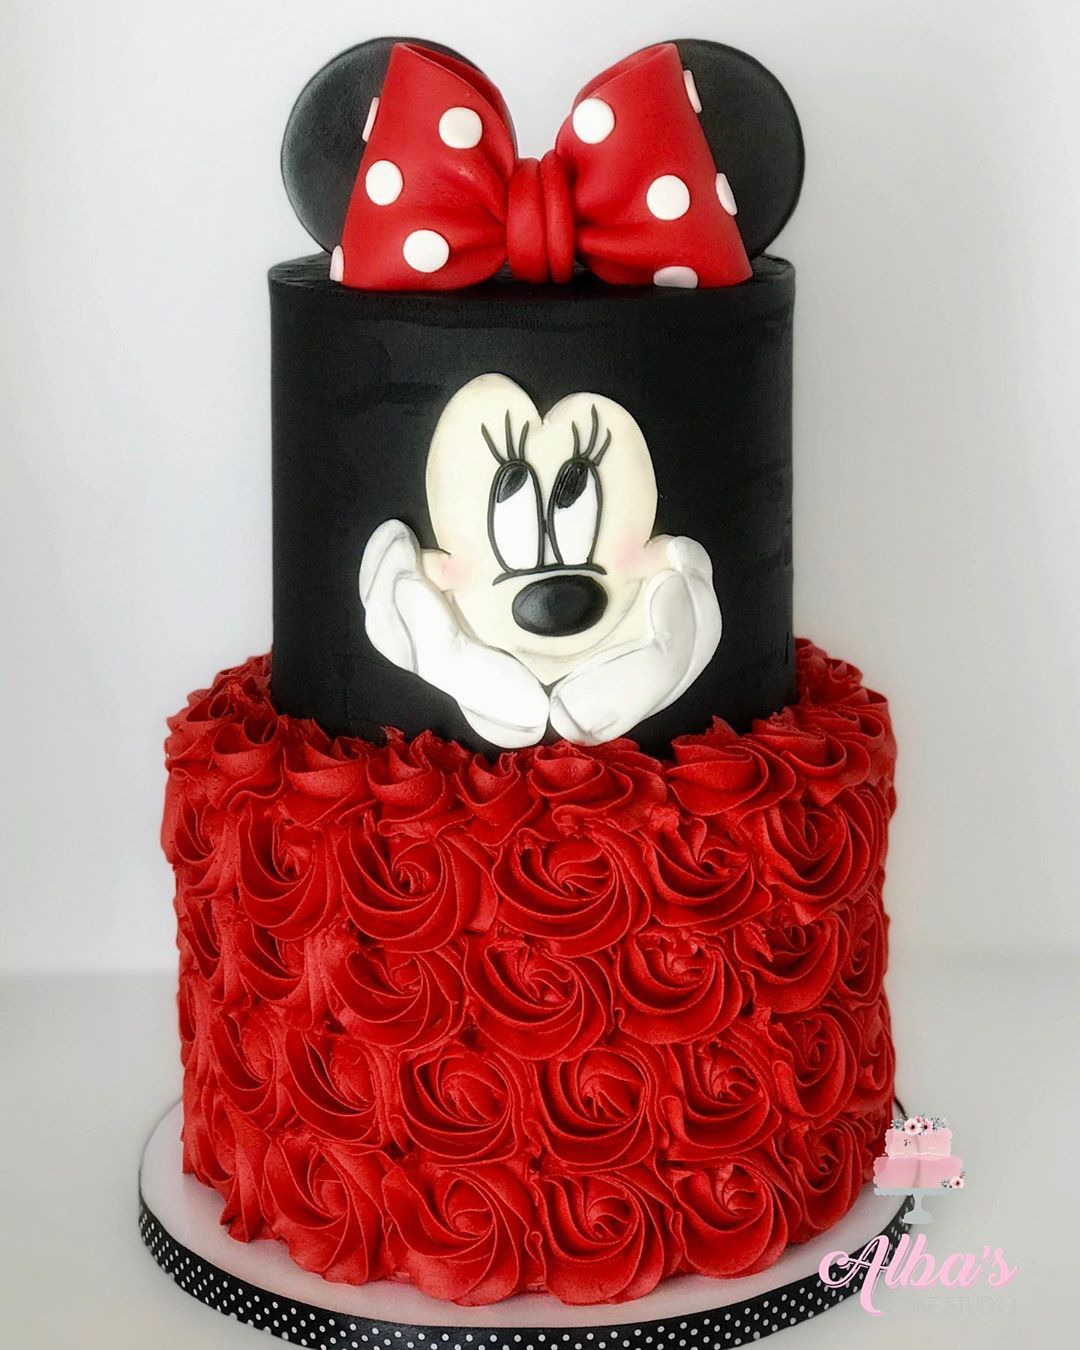 Red Black Rosette Minnie Mouse Cake Minnie Mouse Birthday Cakes Minnie Mouse Cake Minnie Mouse First Birthday